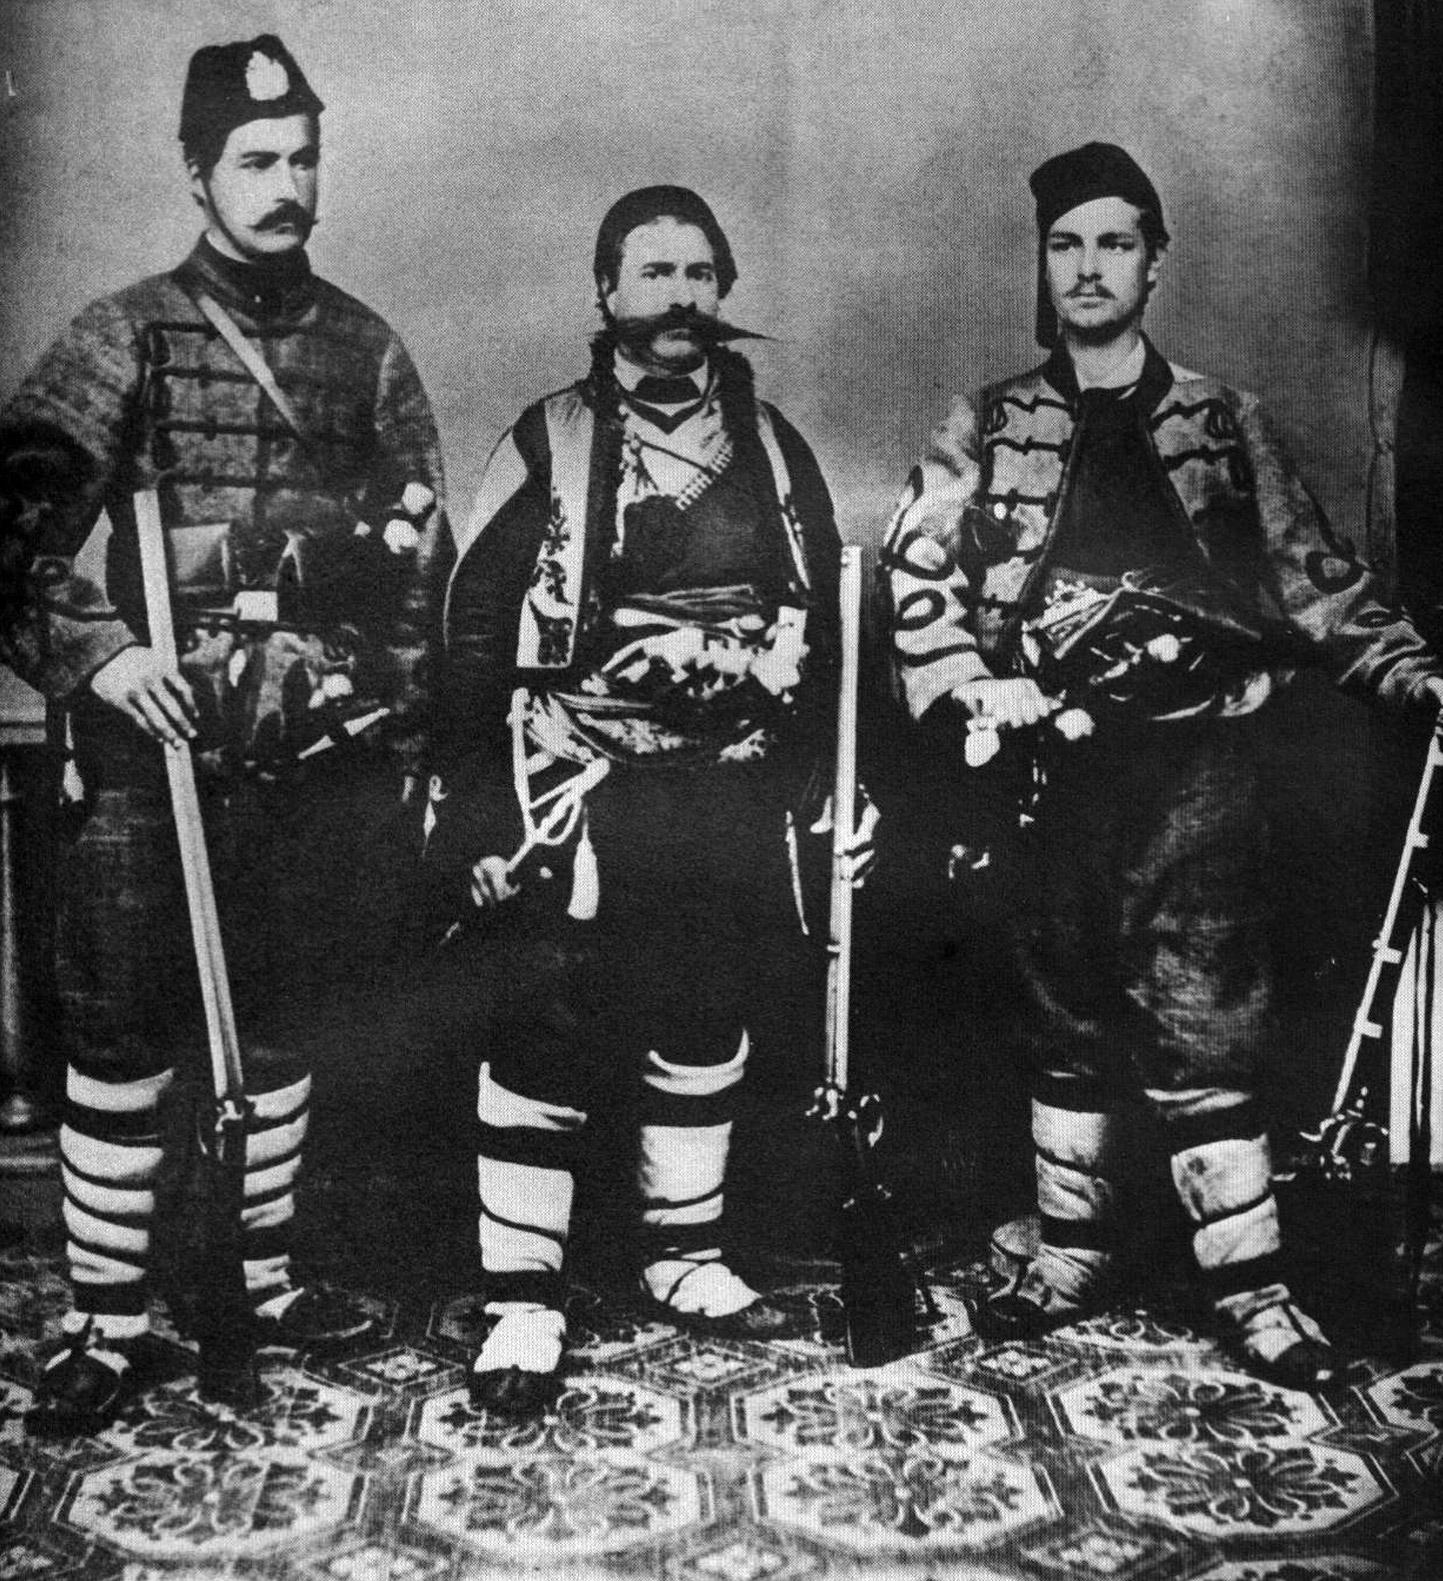 Иван Кършовски, Панайот Хитов и Иван Зерделийски